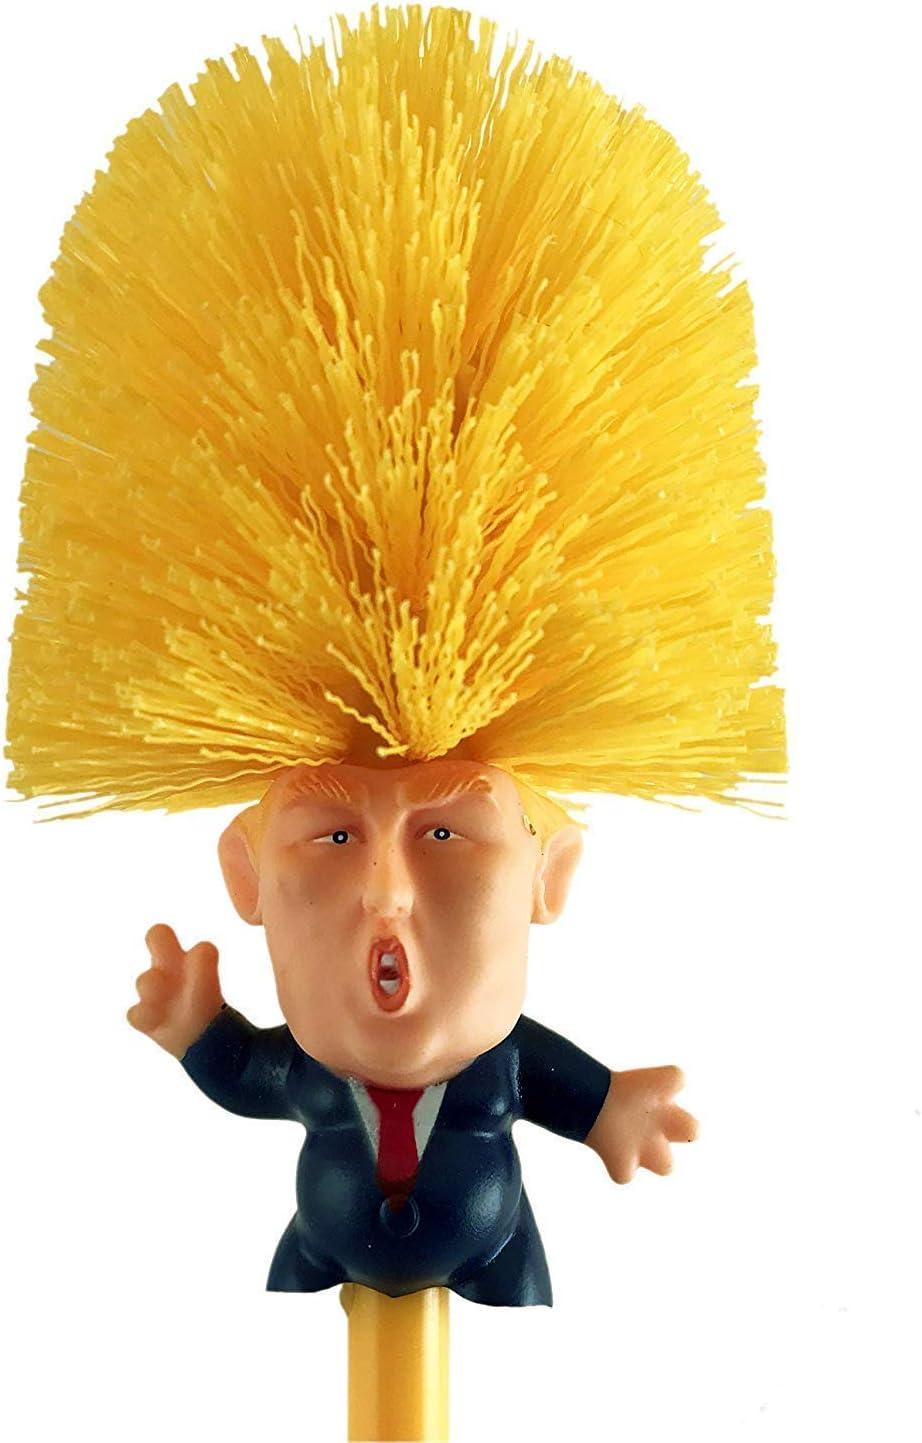 Fashion Trump Cartoon Portrait Portable Toilet Brush//set//toilet Paper Roll Paper